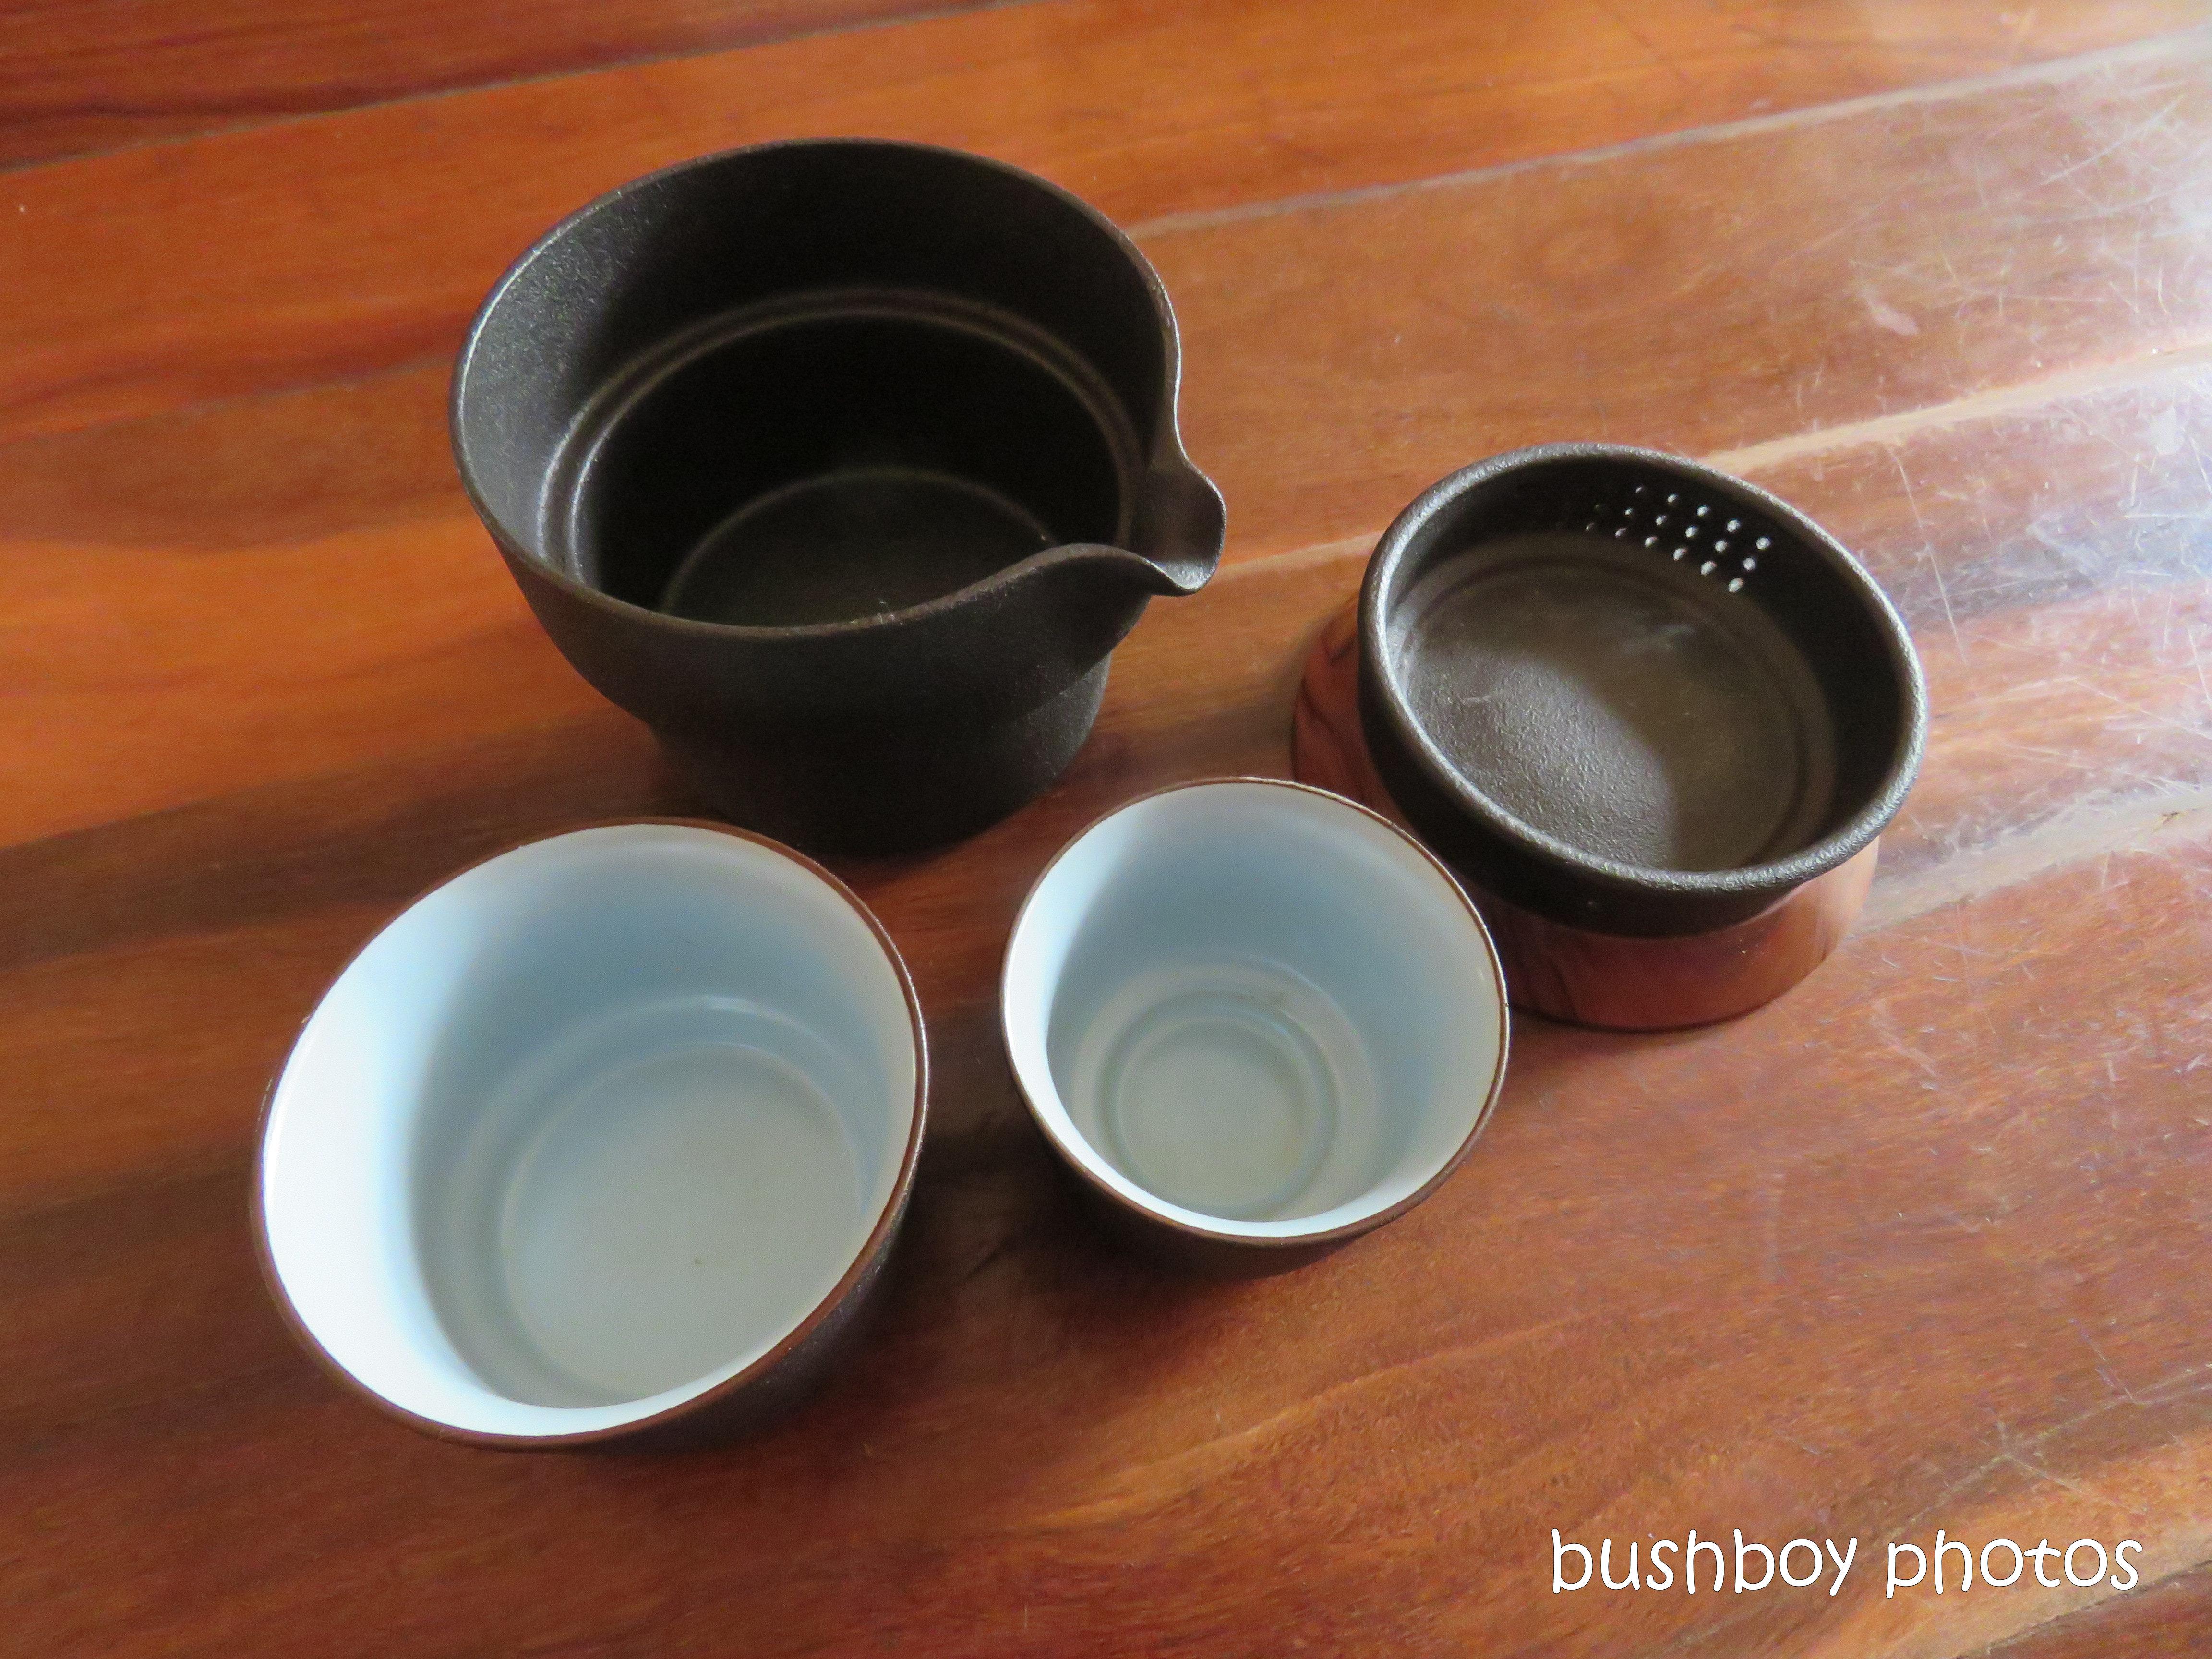 taiwanese_cups_tea_guests_durranbah bush retreat_oct 2018 (2)